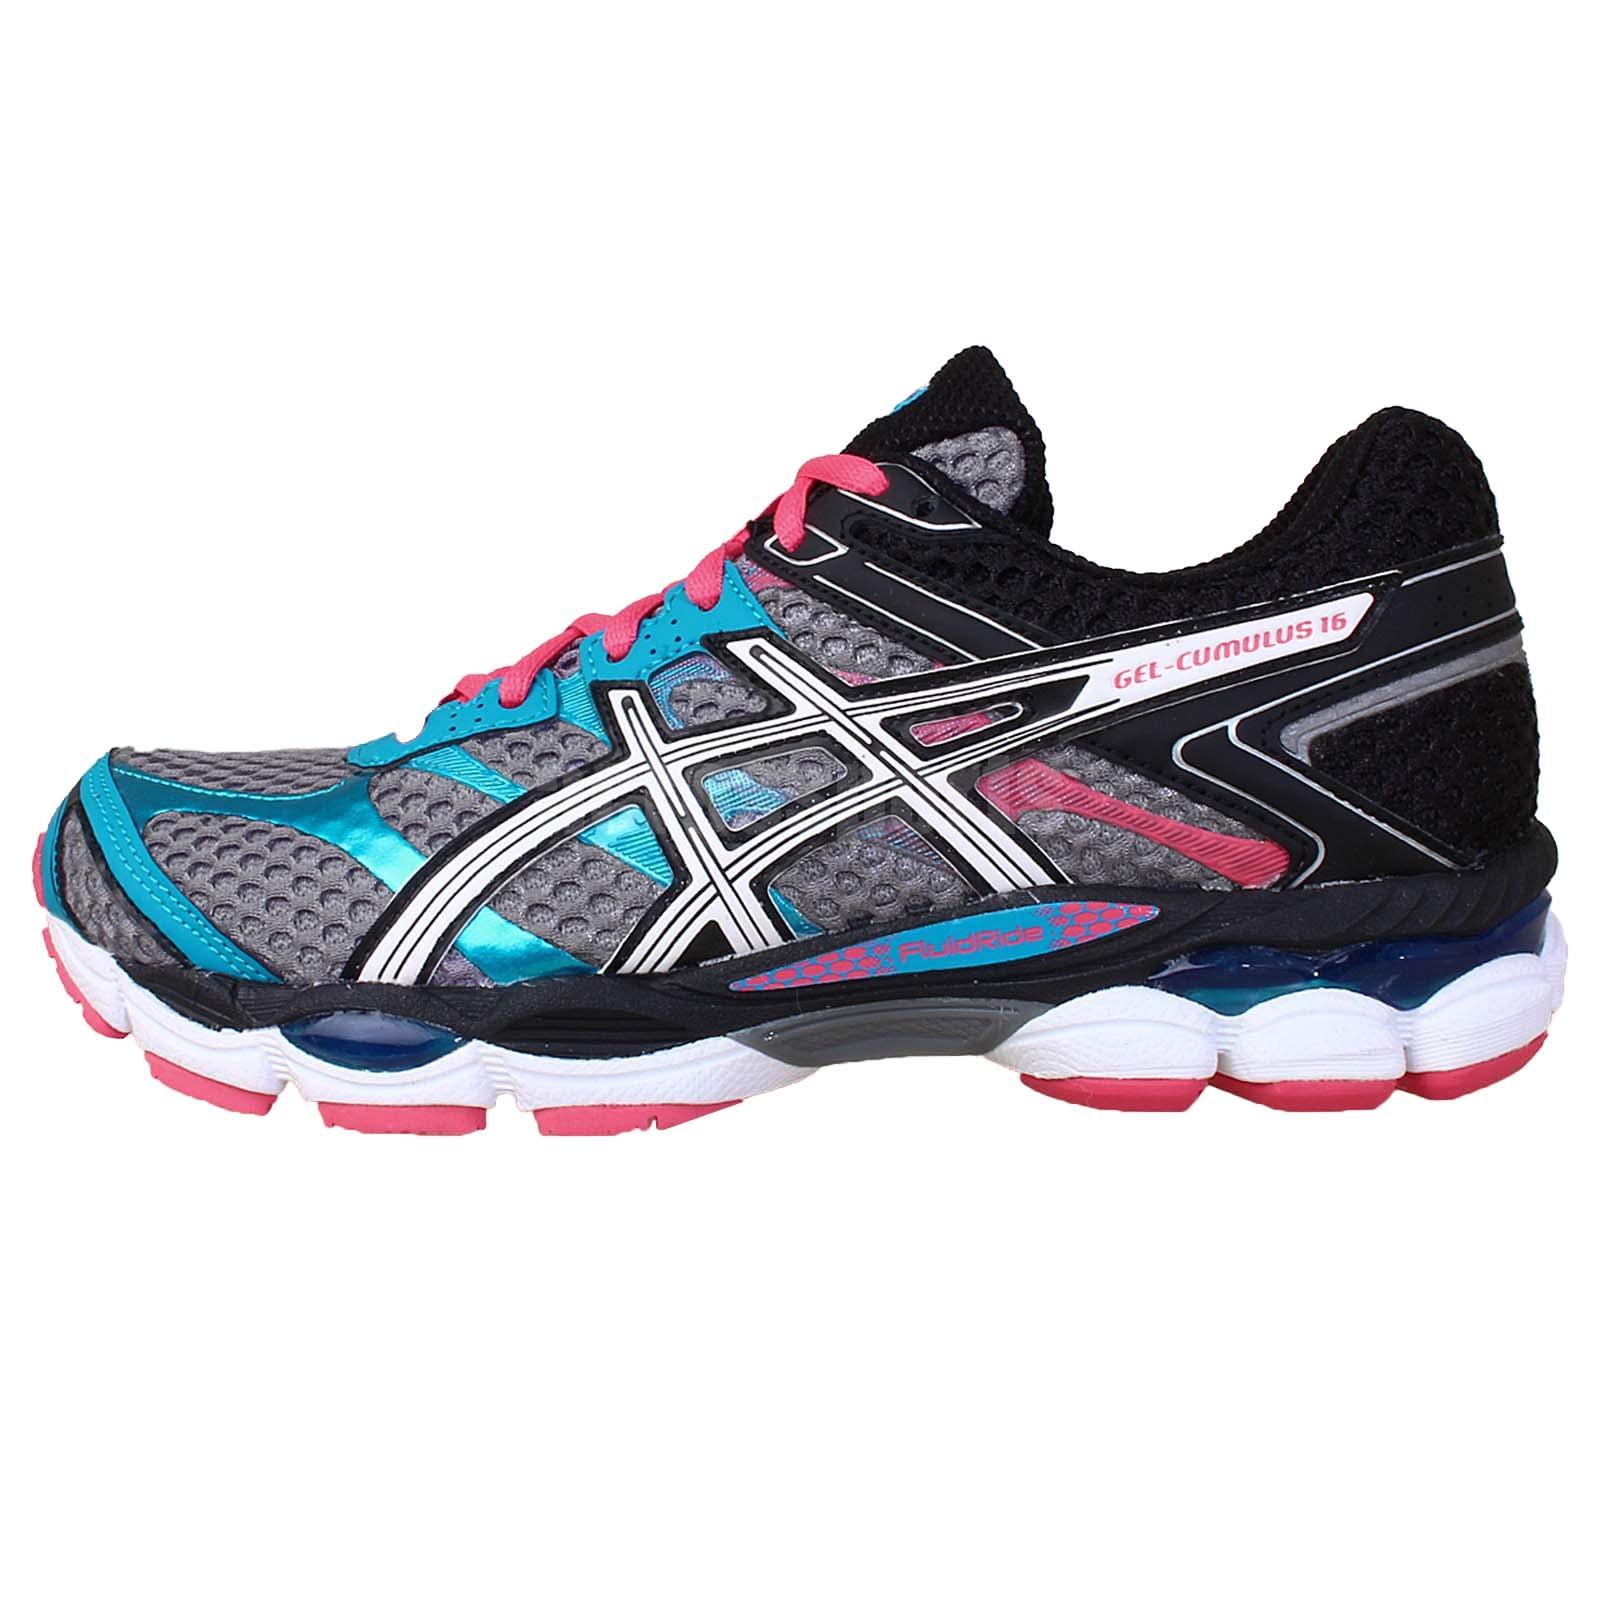 asics gel cumulus 16 grey pink blue womens jogging running shoes sneakers ebay. Black Bedroom Furniture Sets. Home Design Ideas